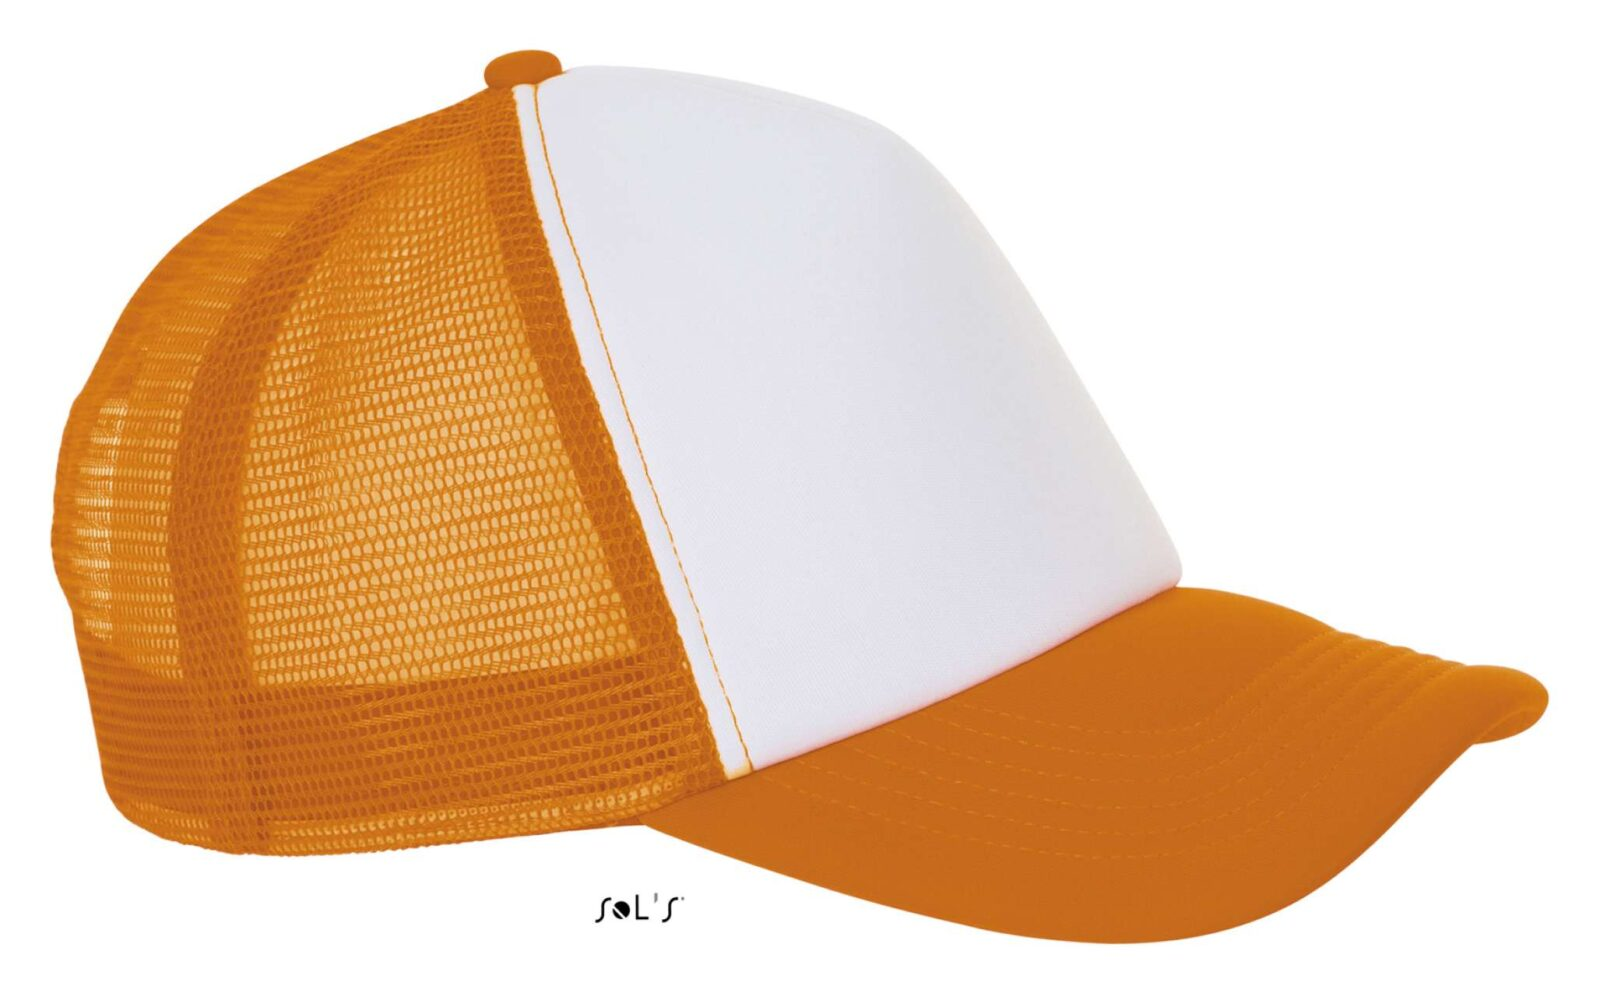 Sapca plasa neon orange portocaliu SO01668 Sepci personalizate trucker panele inchidere cozoroace accesorii caciuli fulare termotransfer serigrafie broderie